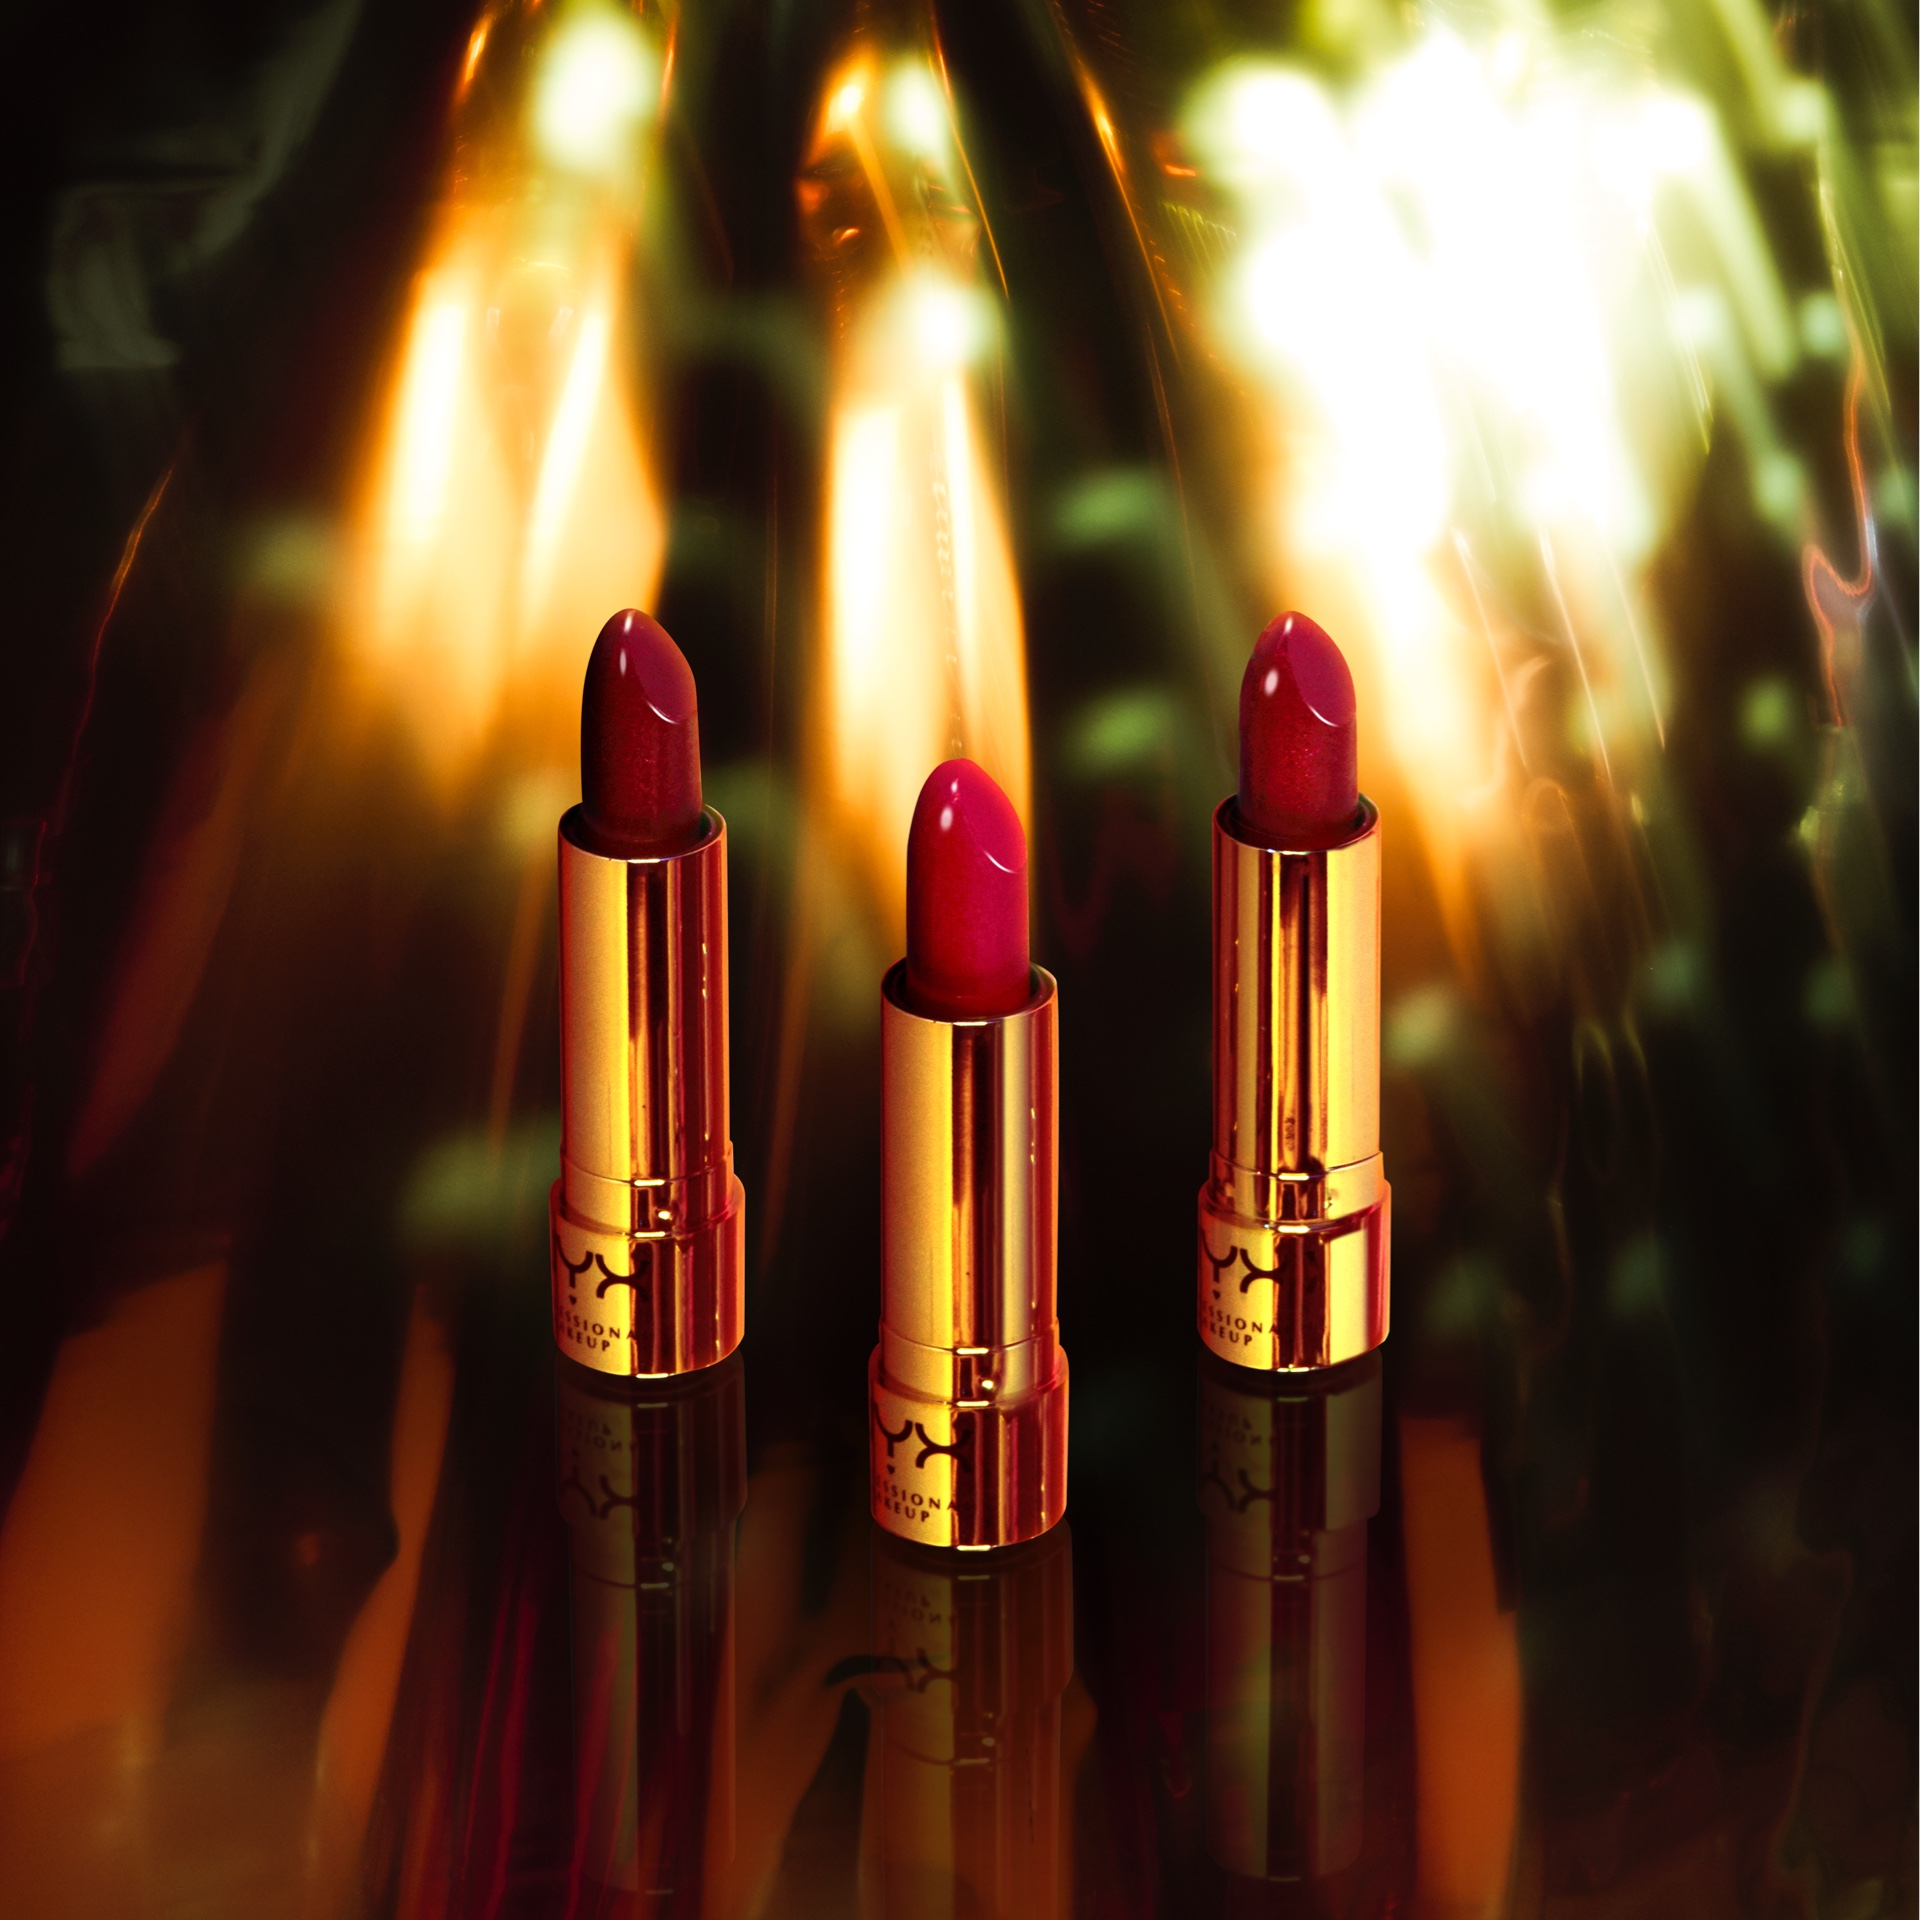 Satin Cream Lipstick, Sparkle Lipstick, Metallic Topper